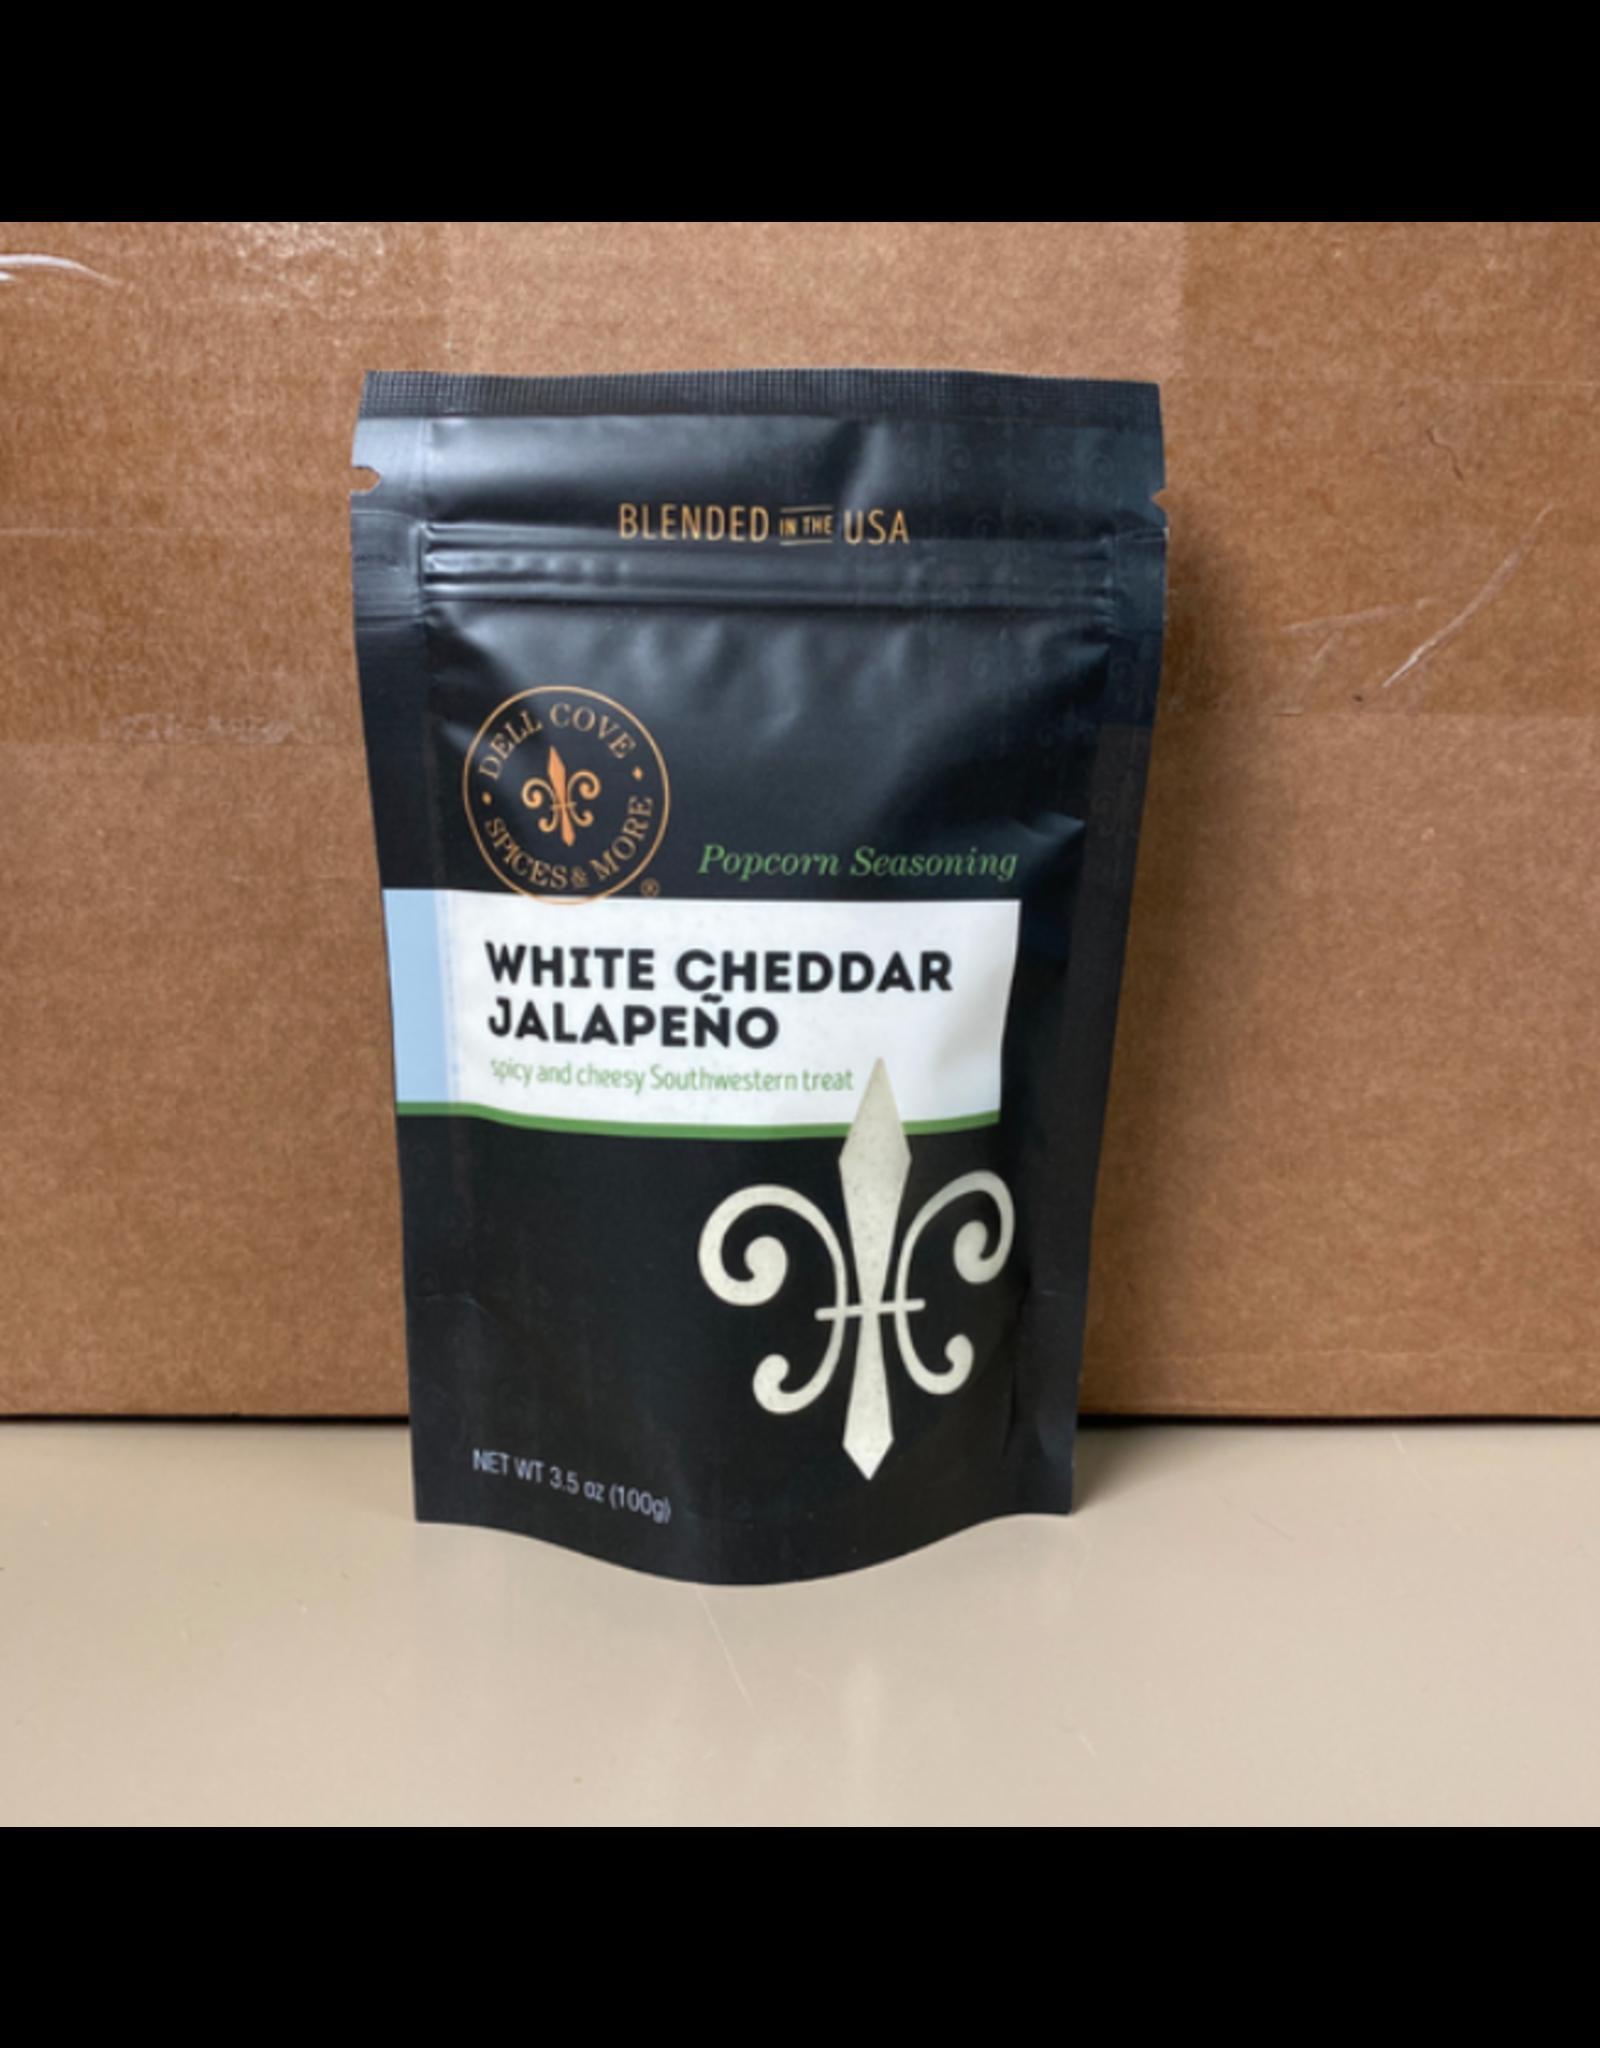 Dell Cove Spices White Cheddar Jalapeno Popcorn Seasoning